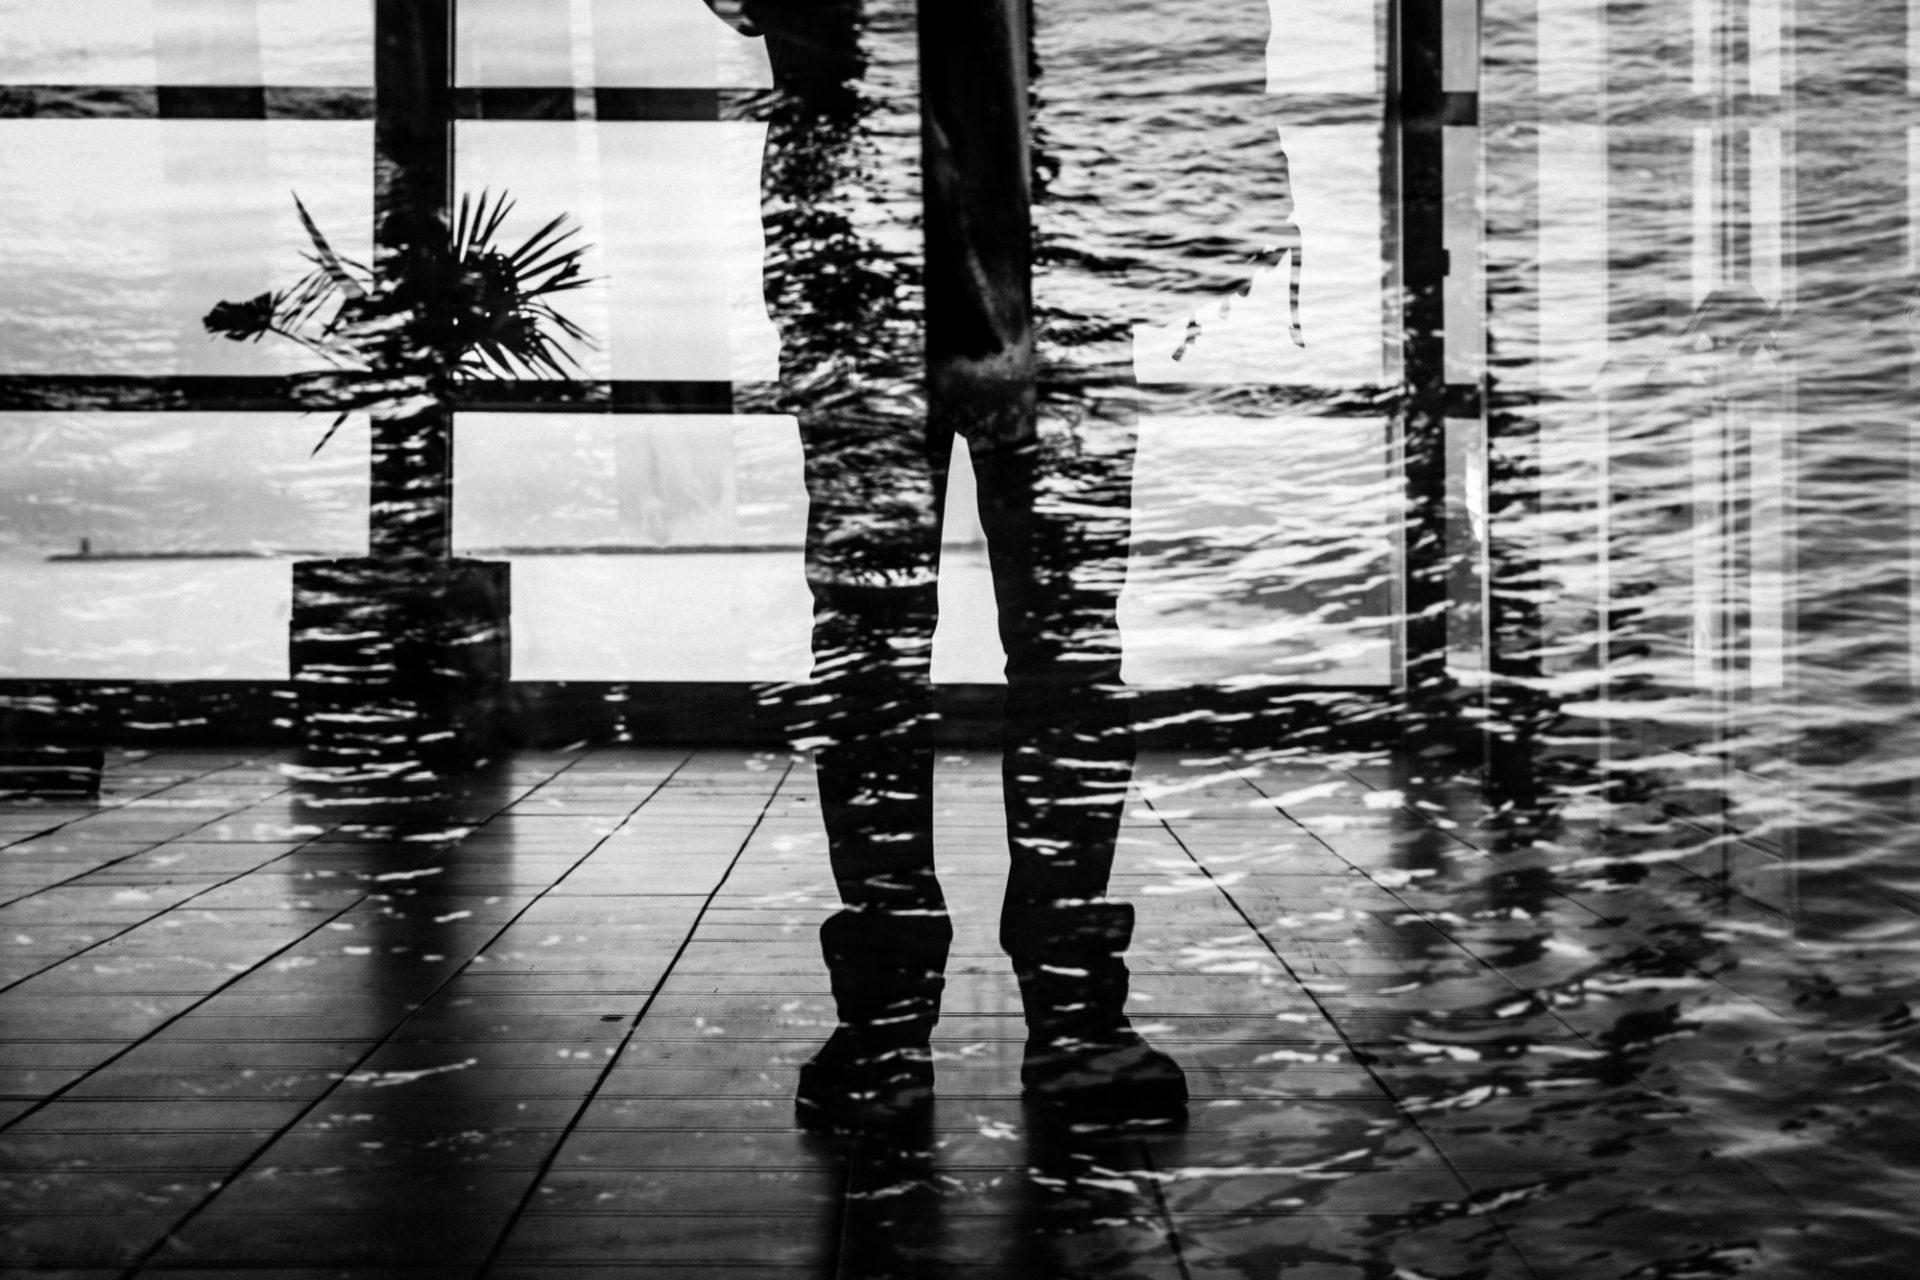 Reflections Series B&W